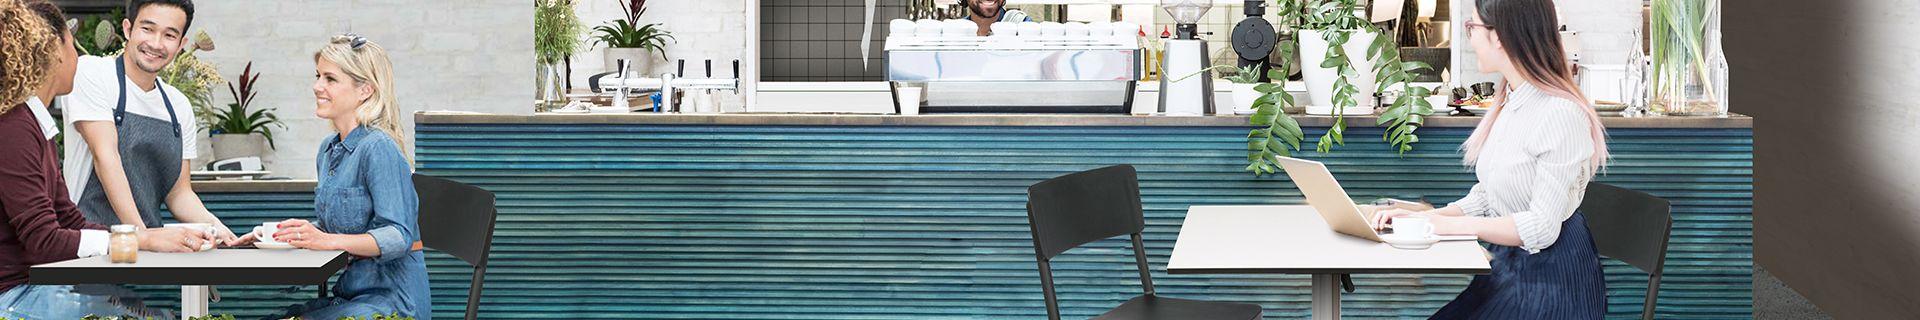 Cafe front using Tusk Living furniture